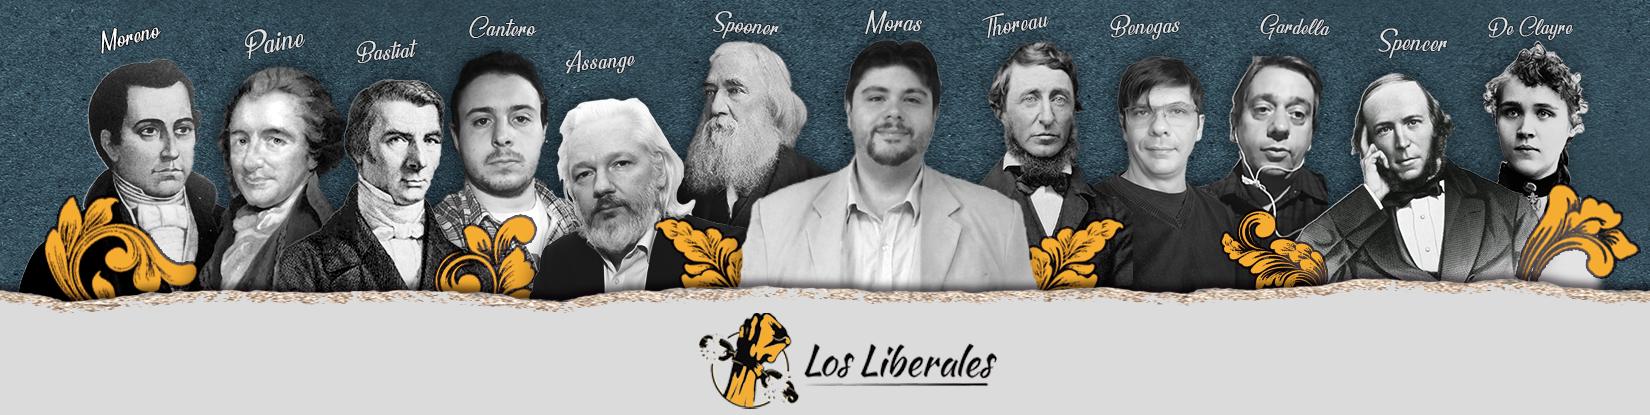 Los Liberales